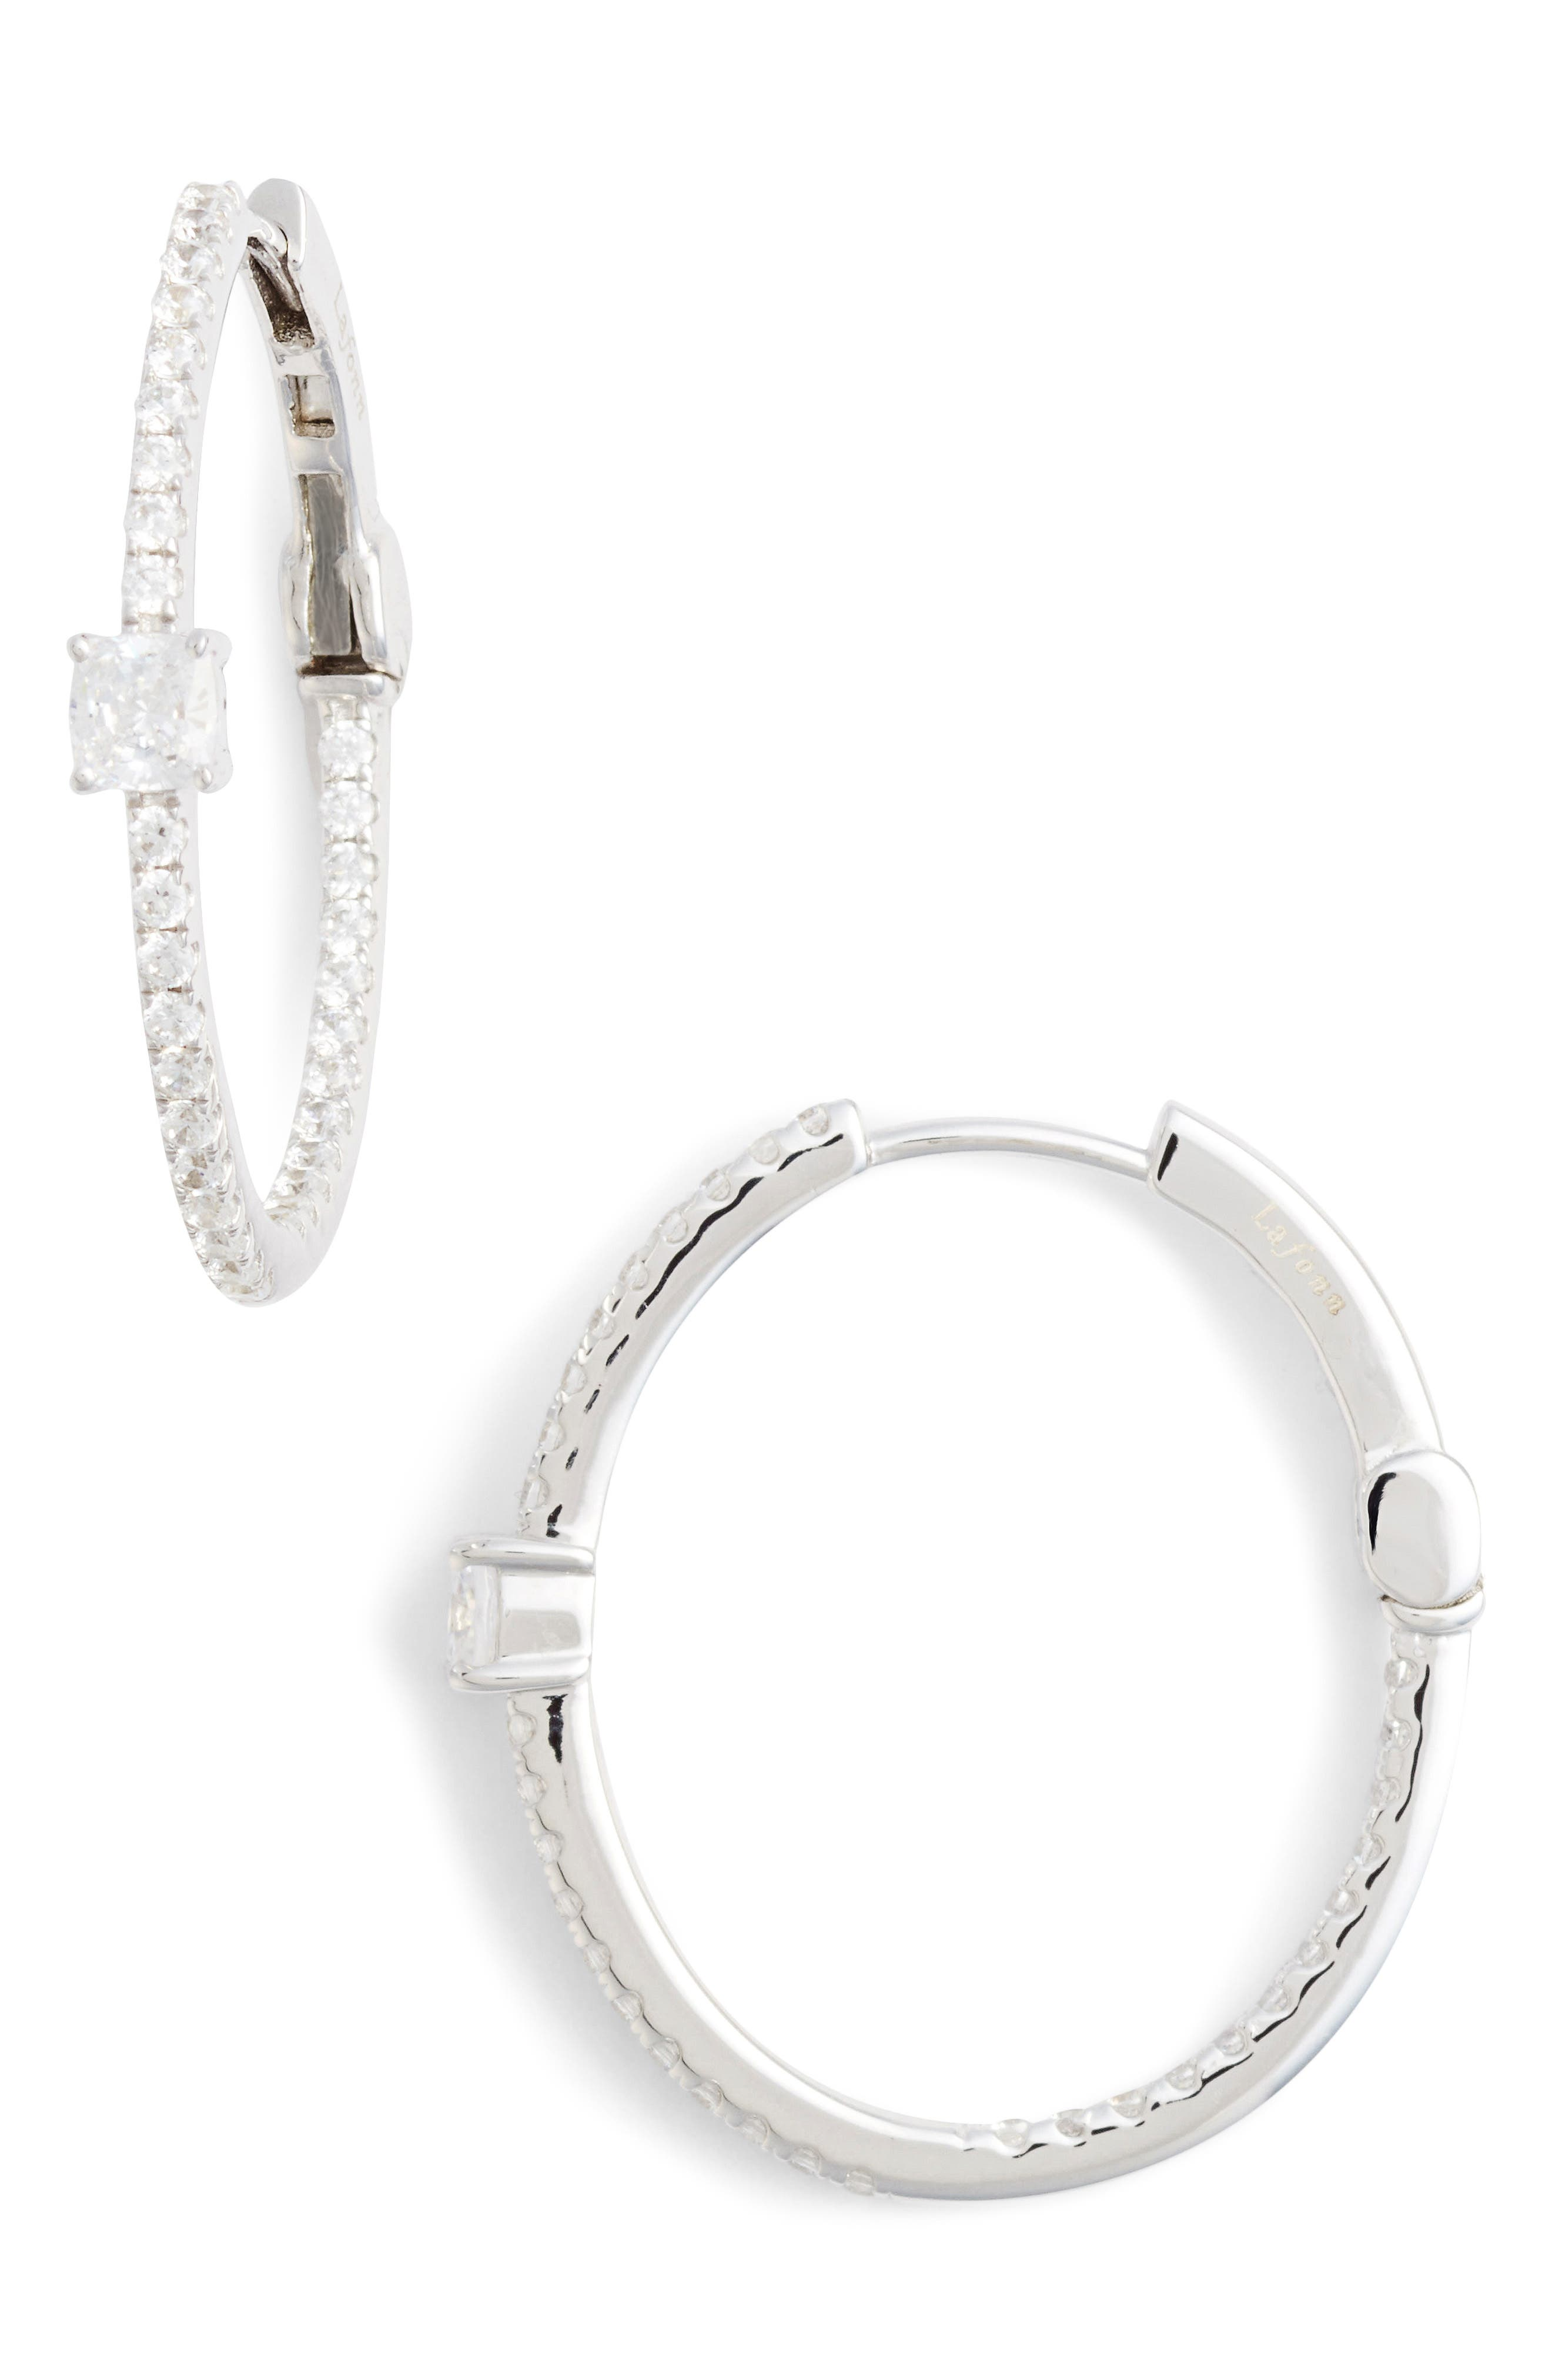 Simulated Diamond Hoop Earrings,                             Main thumbnail 1, color,                             SILVER/ CLEAR